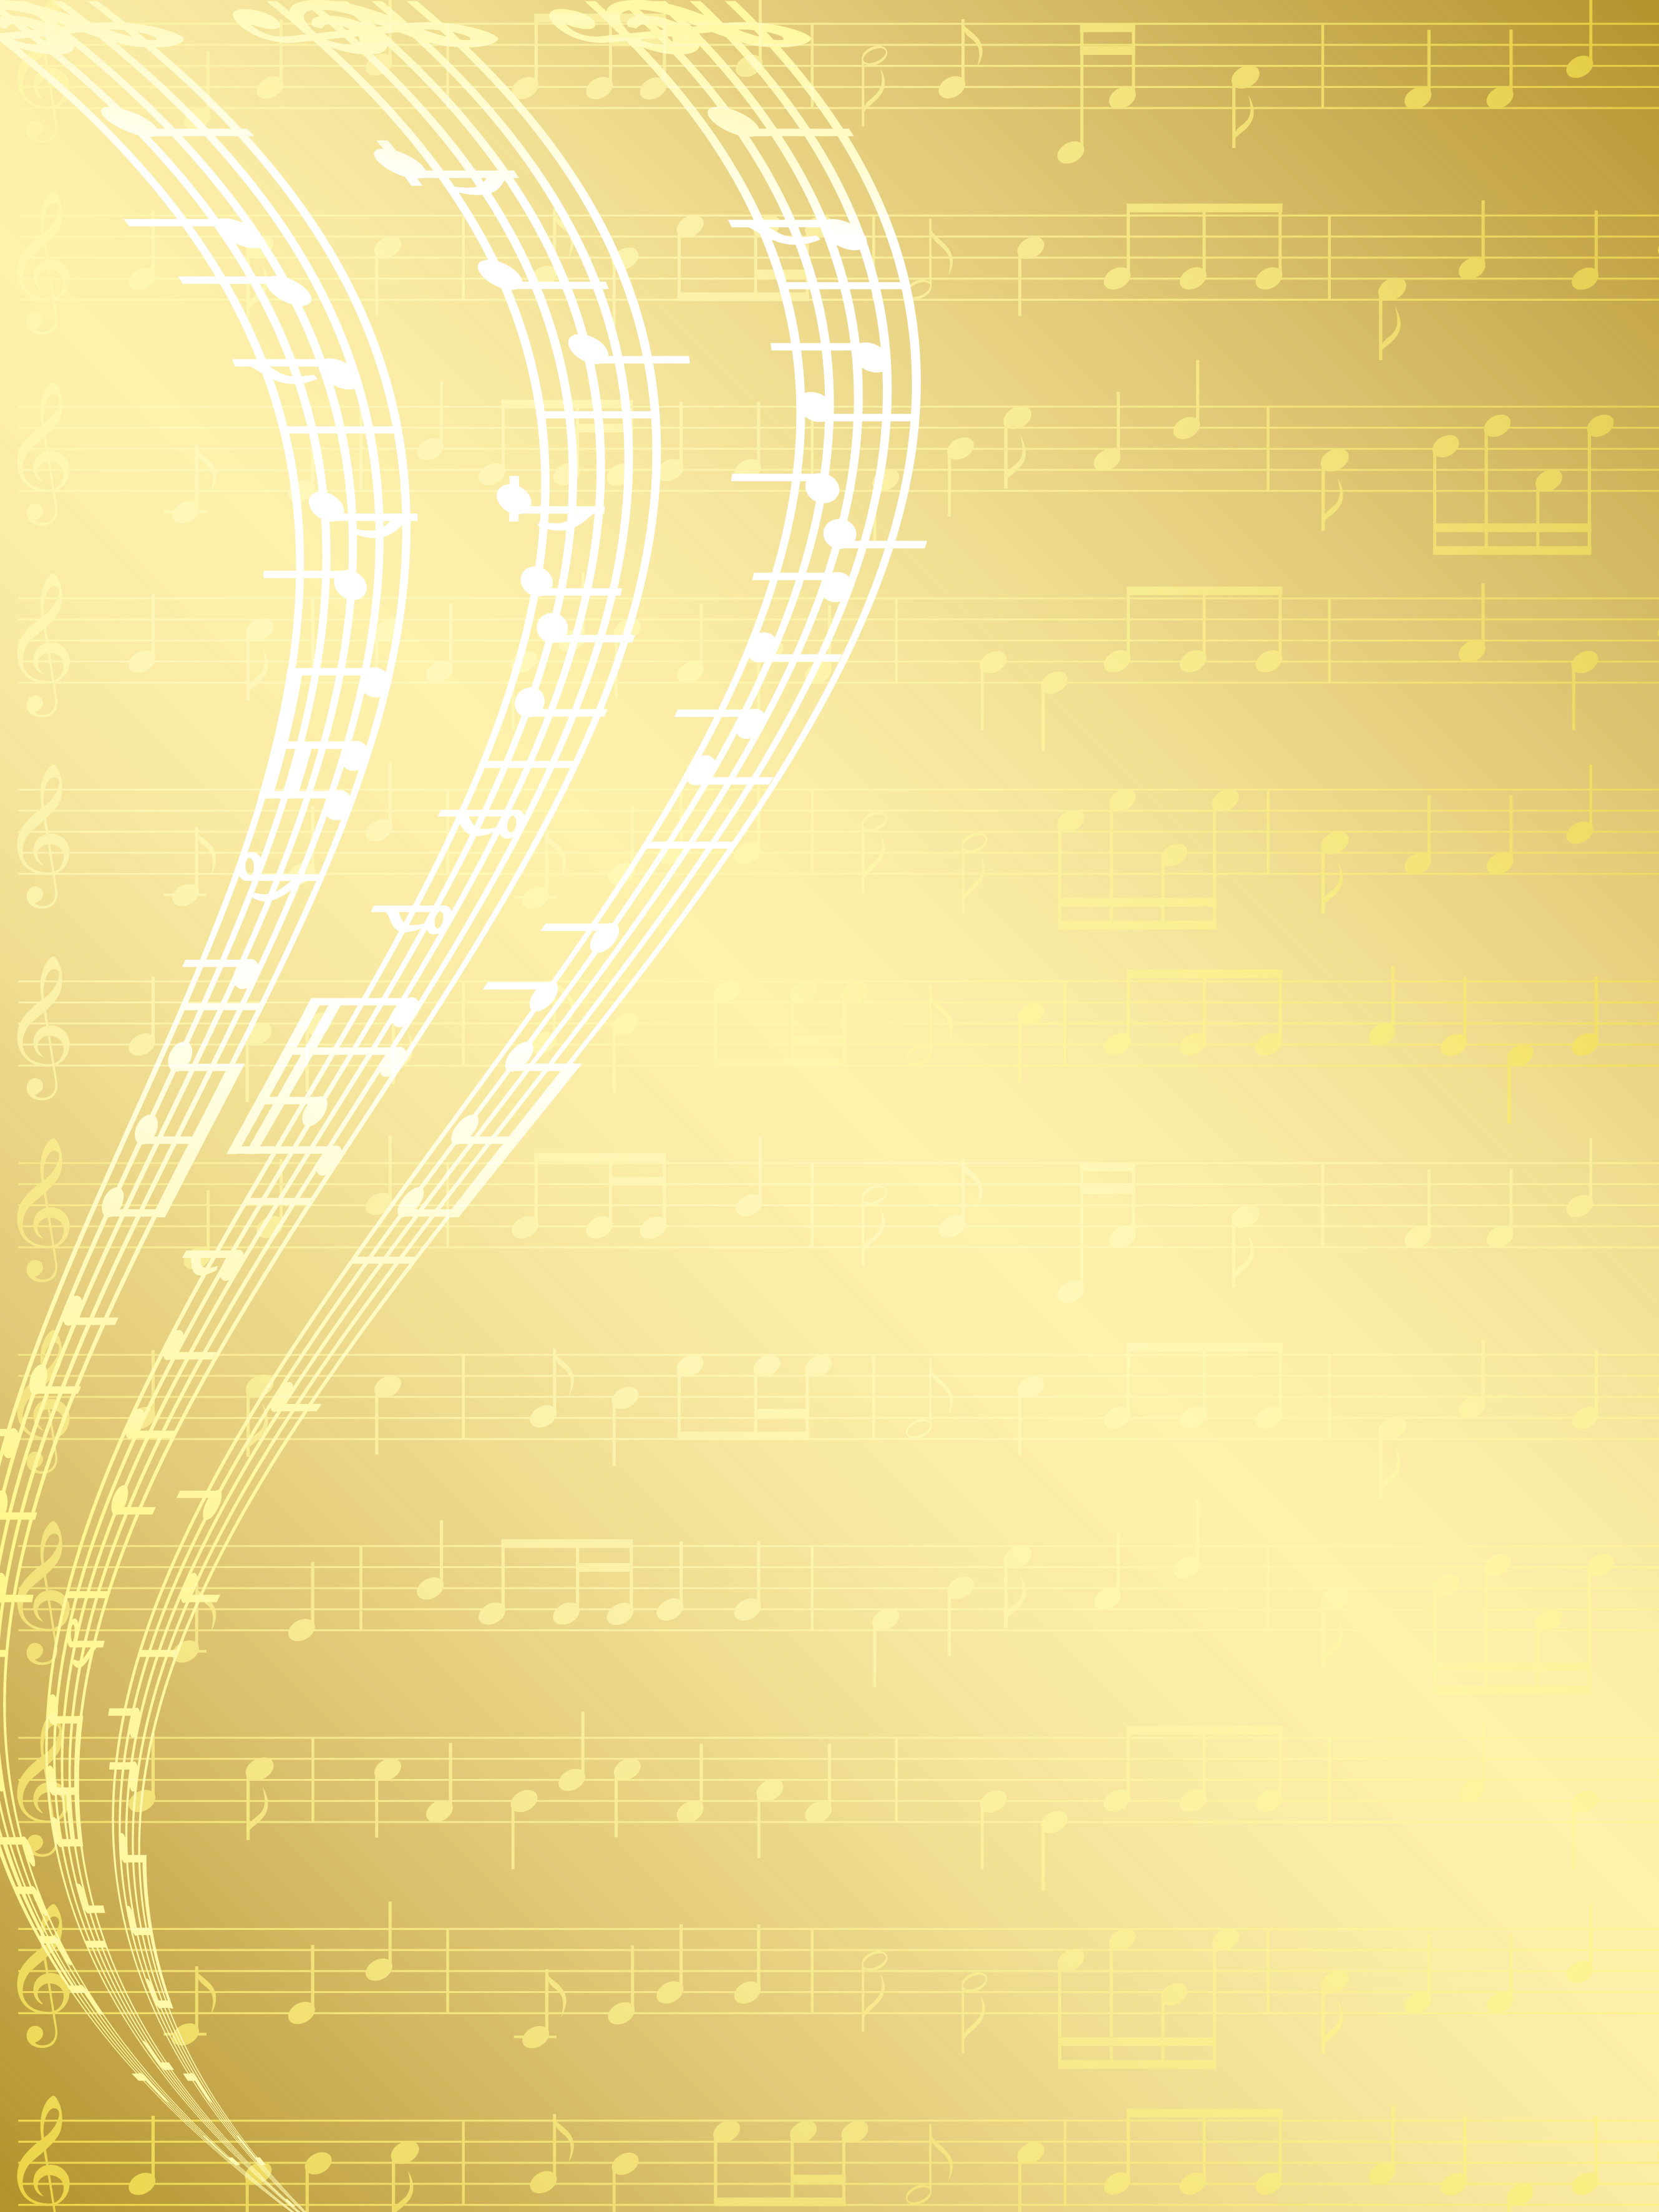 Schwob School of Music: Holiday Brass Concert